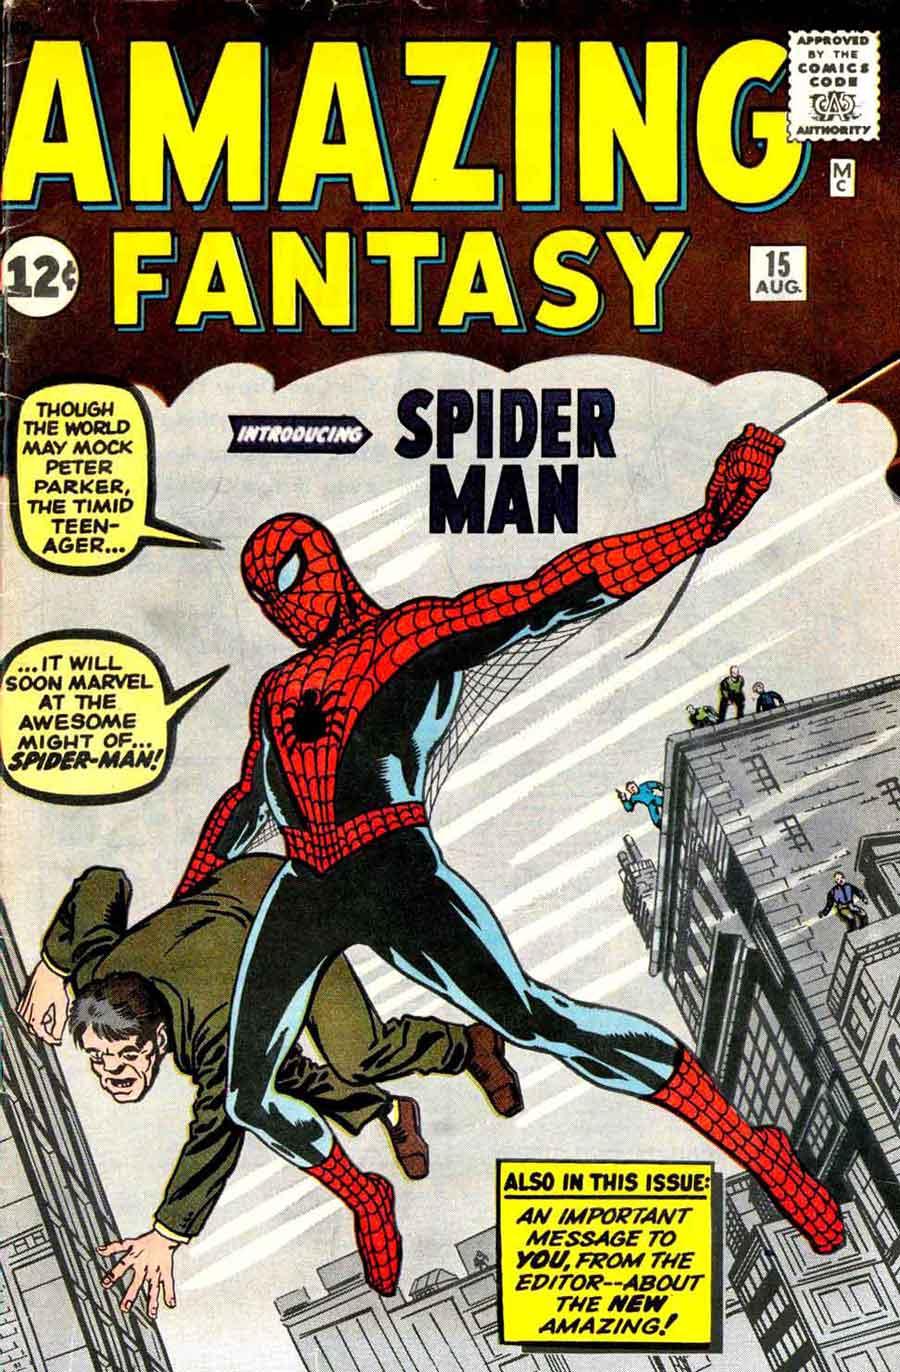 Amazing Fantasy nº 15